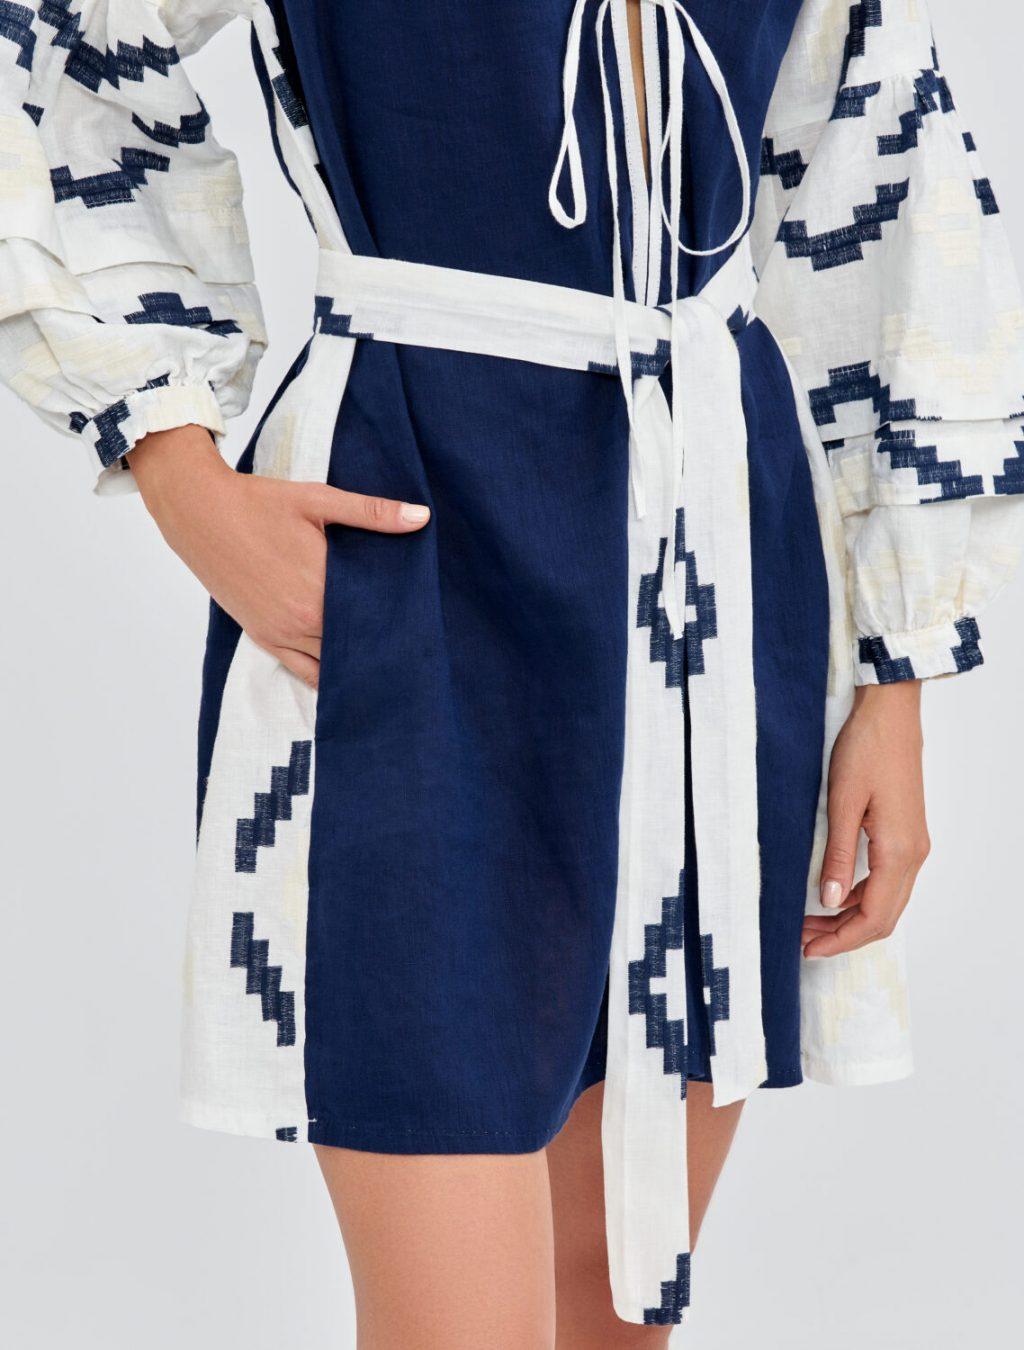 Collection Spring - Summer 2021 KORI-GREEK ARCHAIC MINI KAFTAN DRESS